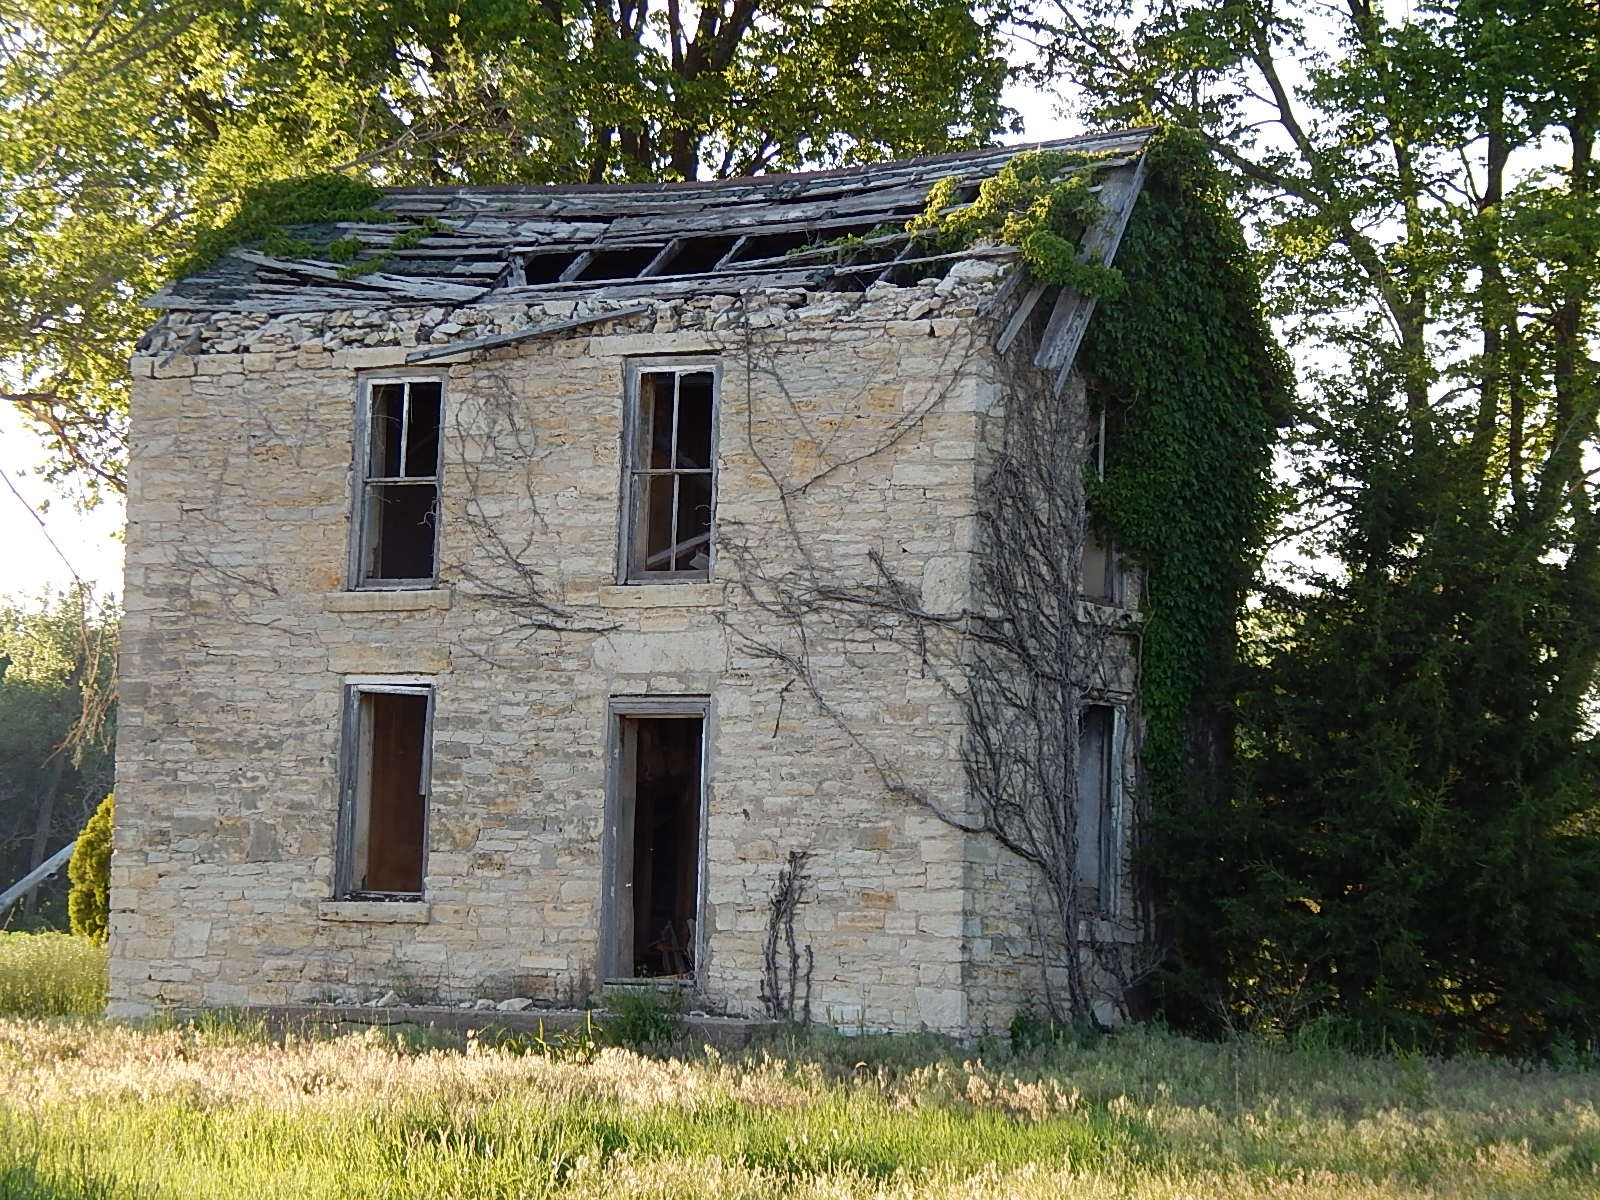 Old farmhouse by Marsha Furman